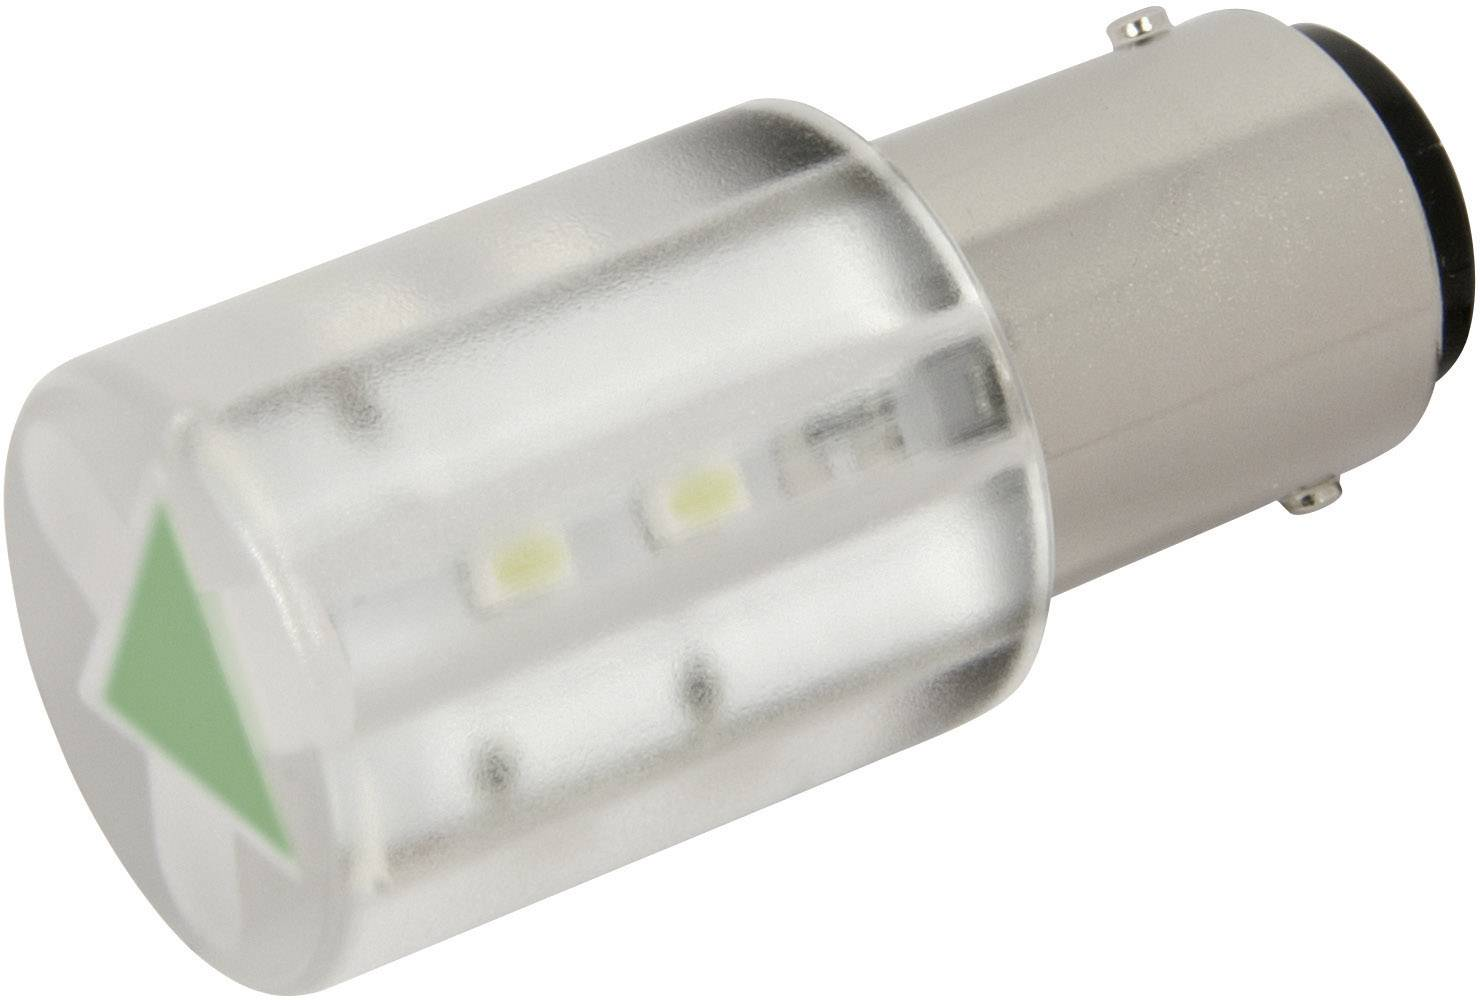 LEDžiarovka CML 18560351, BA15d, 24 V/DC, 24 V/AC, 1050 mcd, zelená